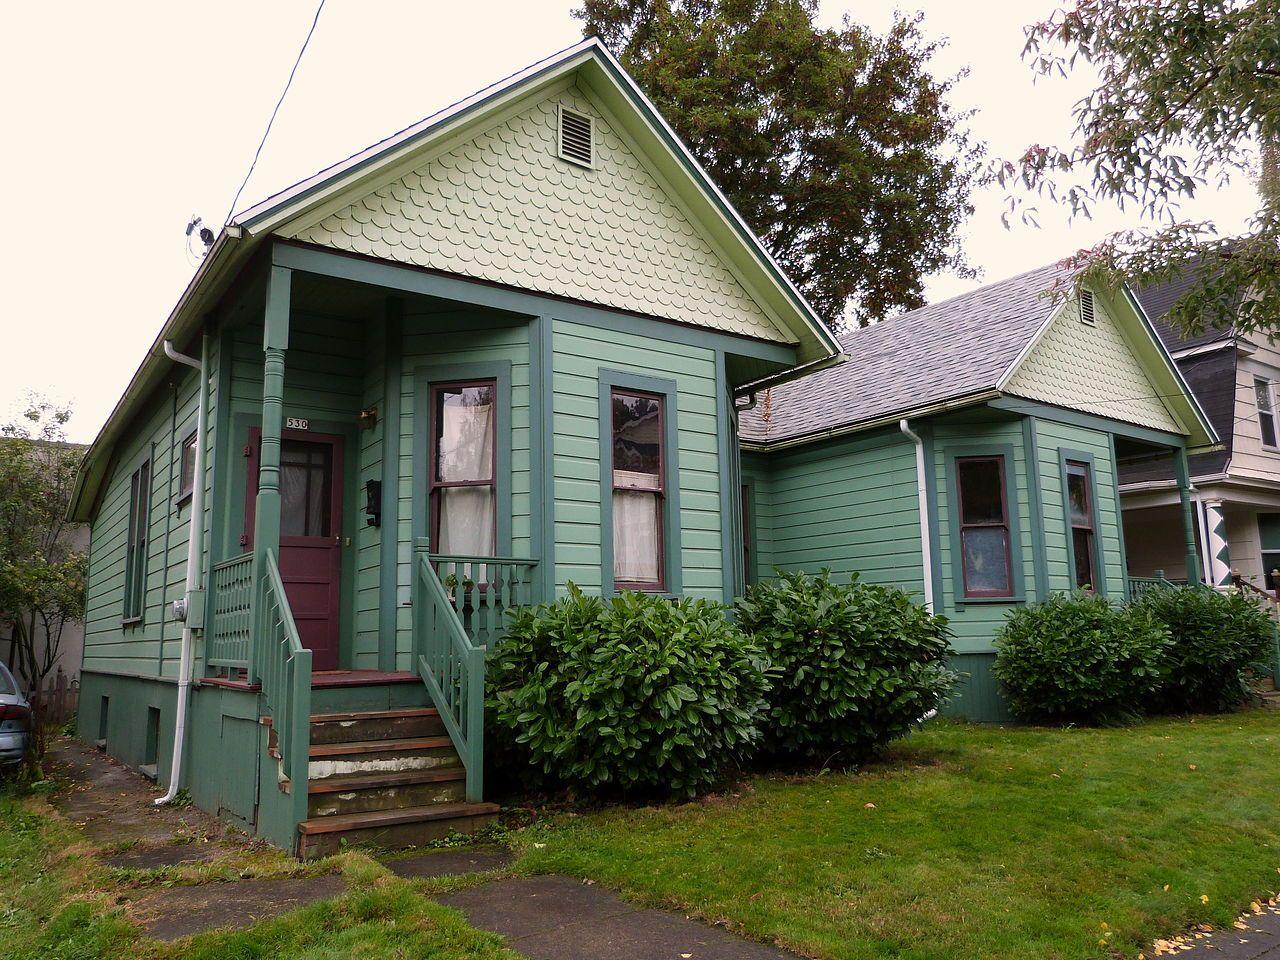 Simon Abraham Duplex In Northeast Portland Oregon Old Houses Northeast Portland Historic Homes